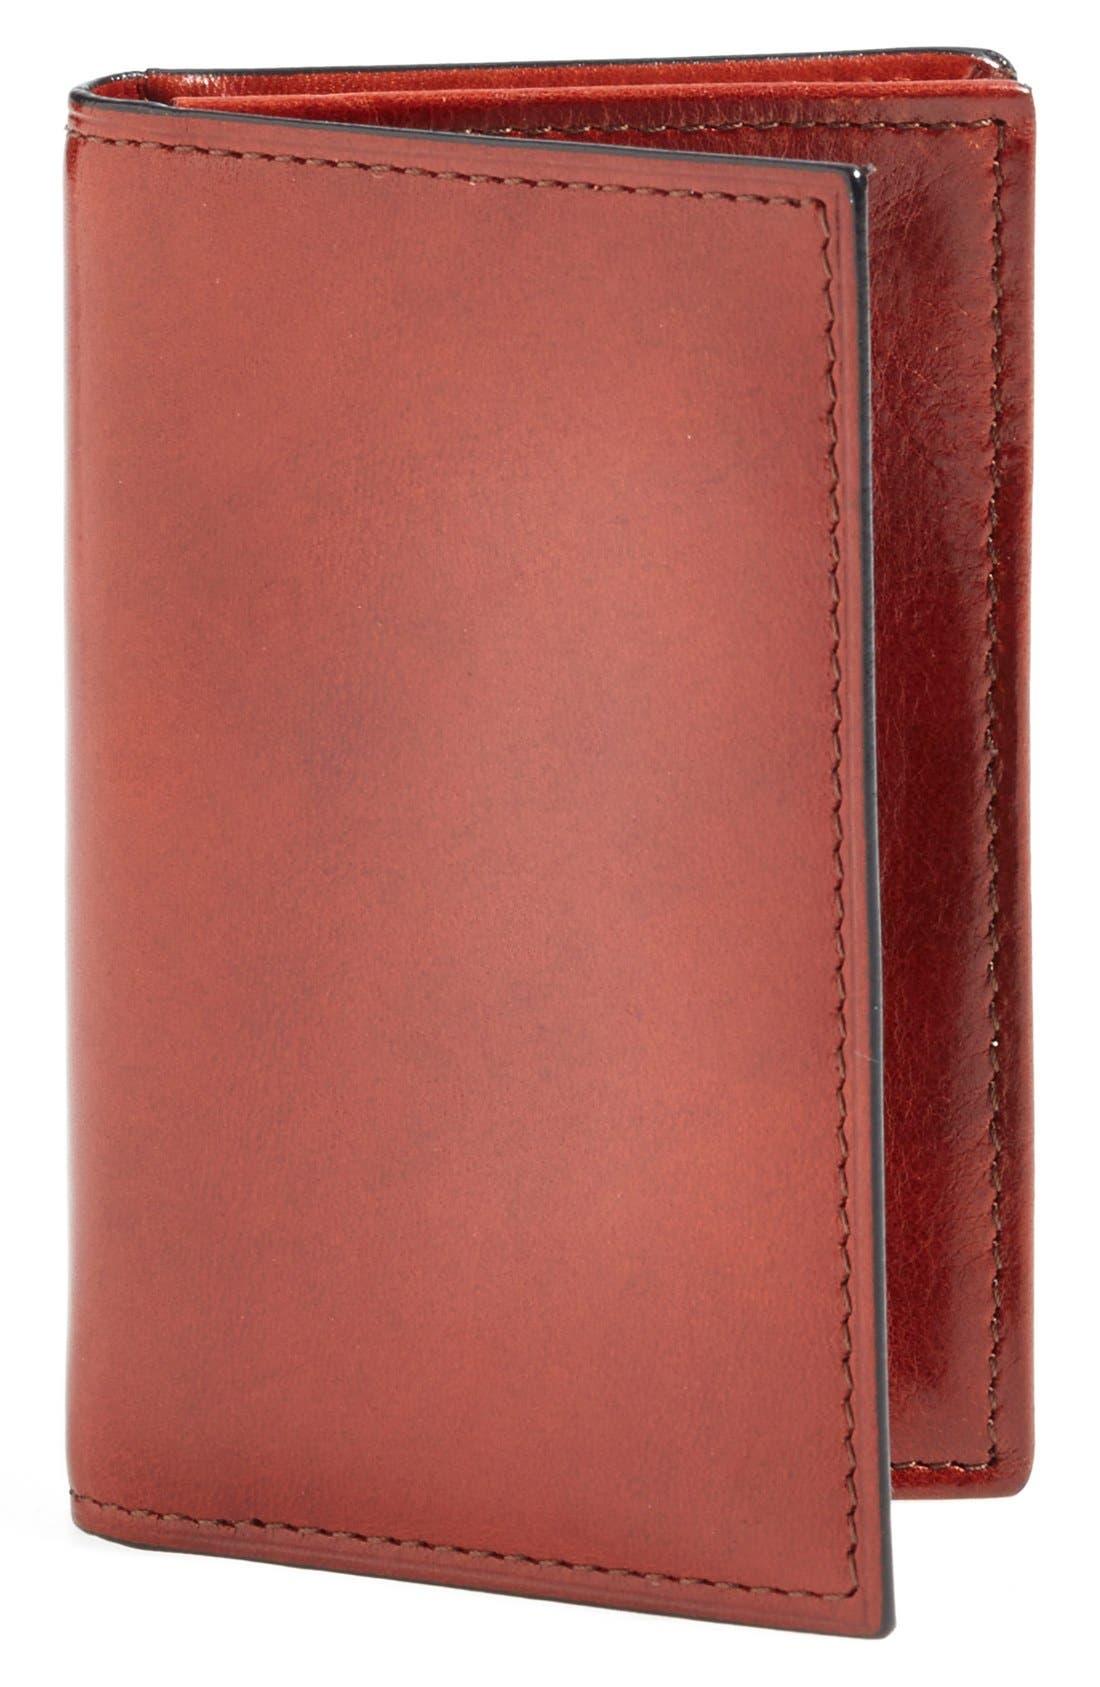 'Old Leather' Gusset Wallet,                             Main thumbnail 1, color,                             COGNAC